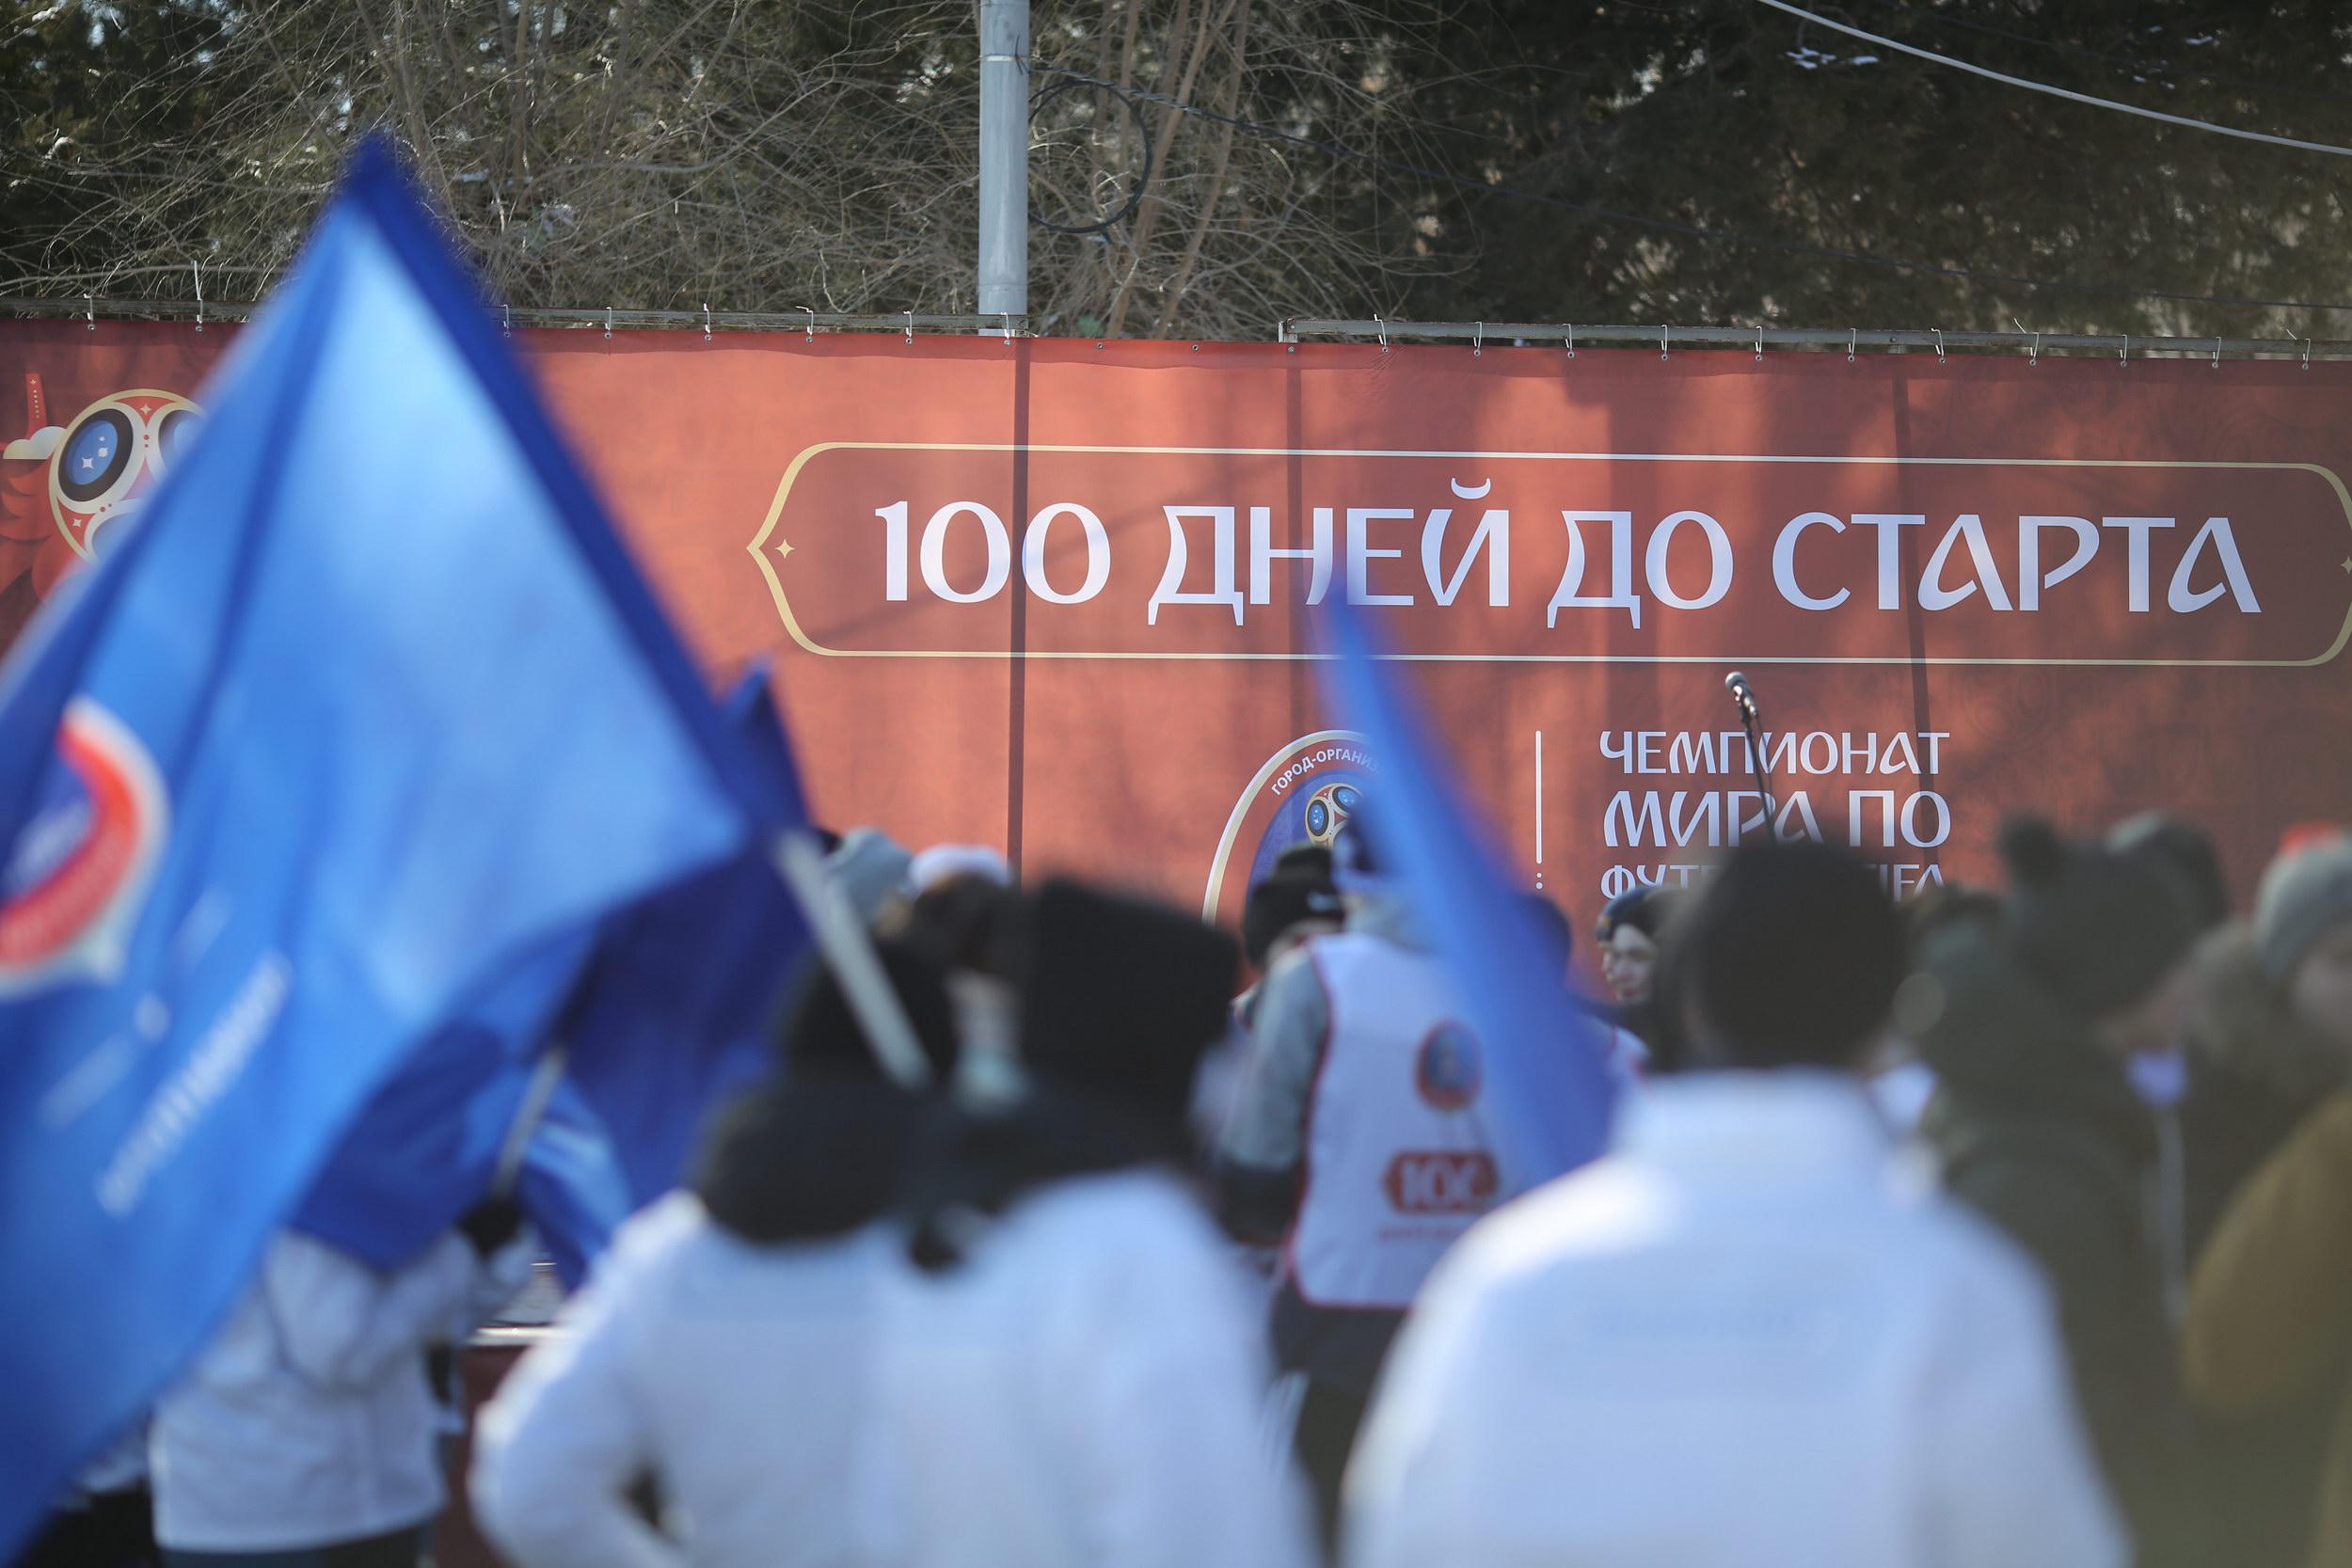 Российские города отметят 100 дней до начала Чемпионата мира по футболу